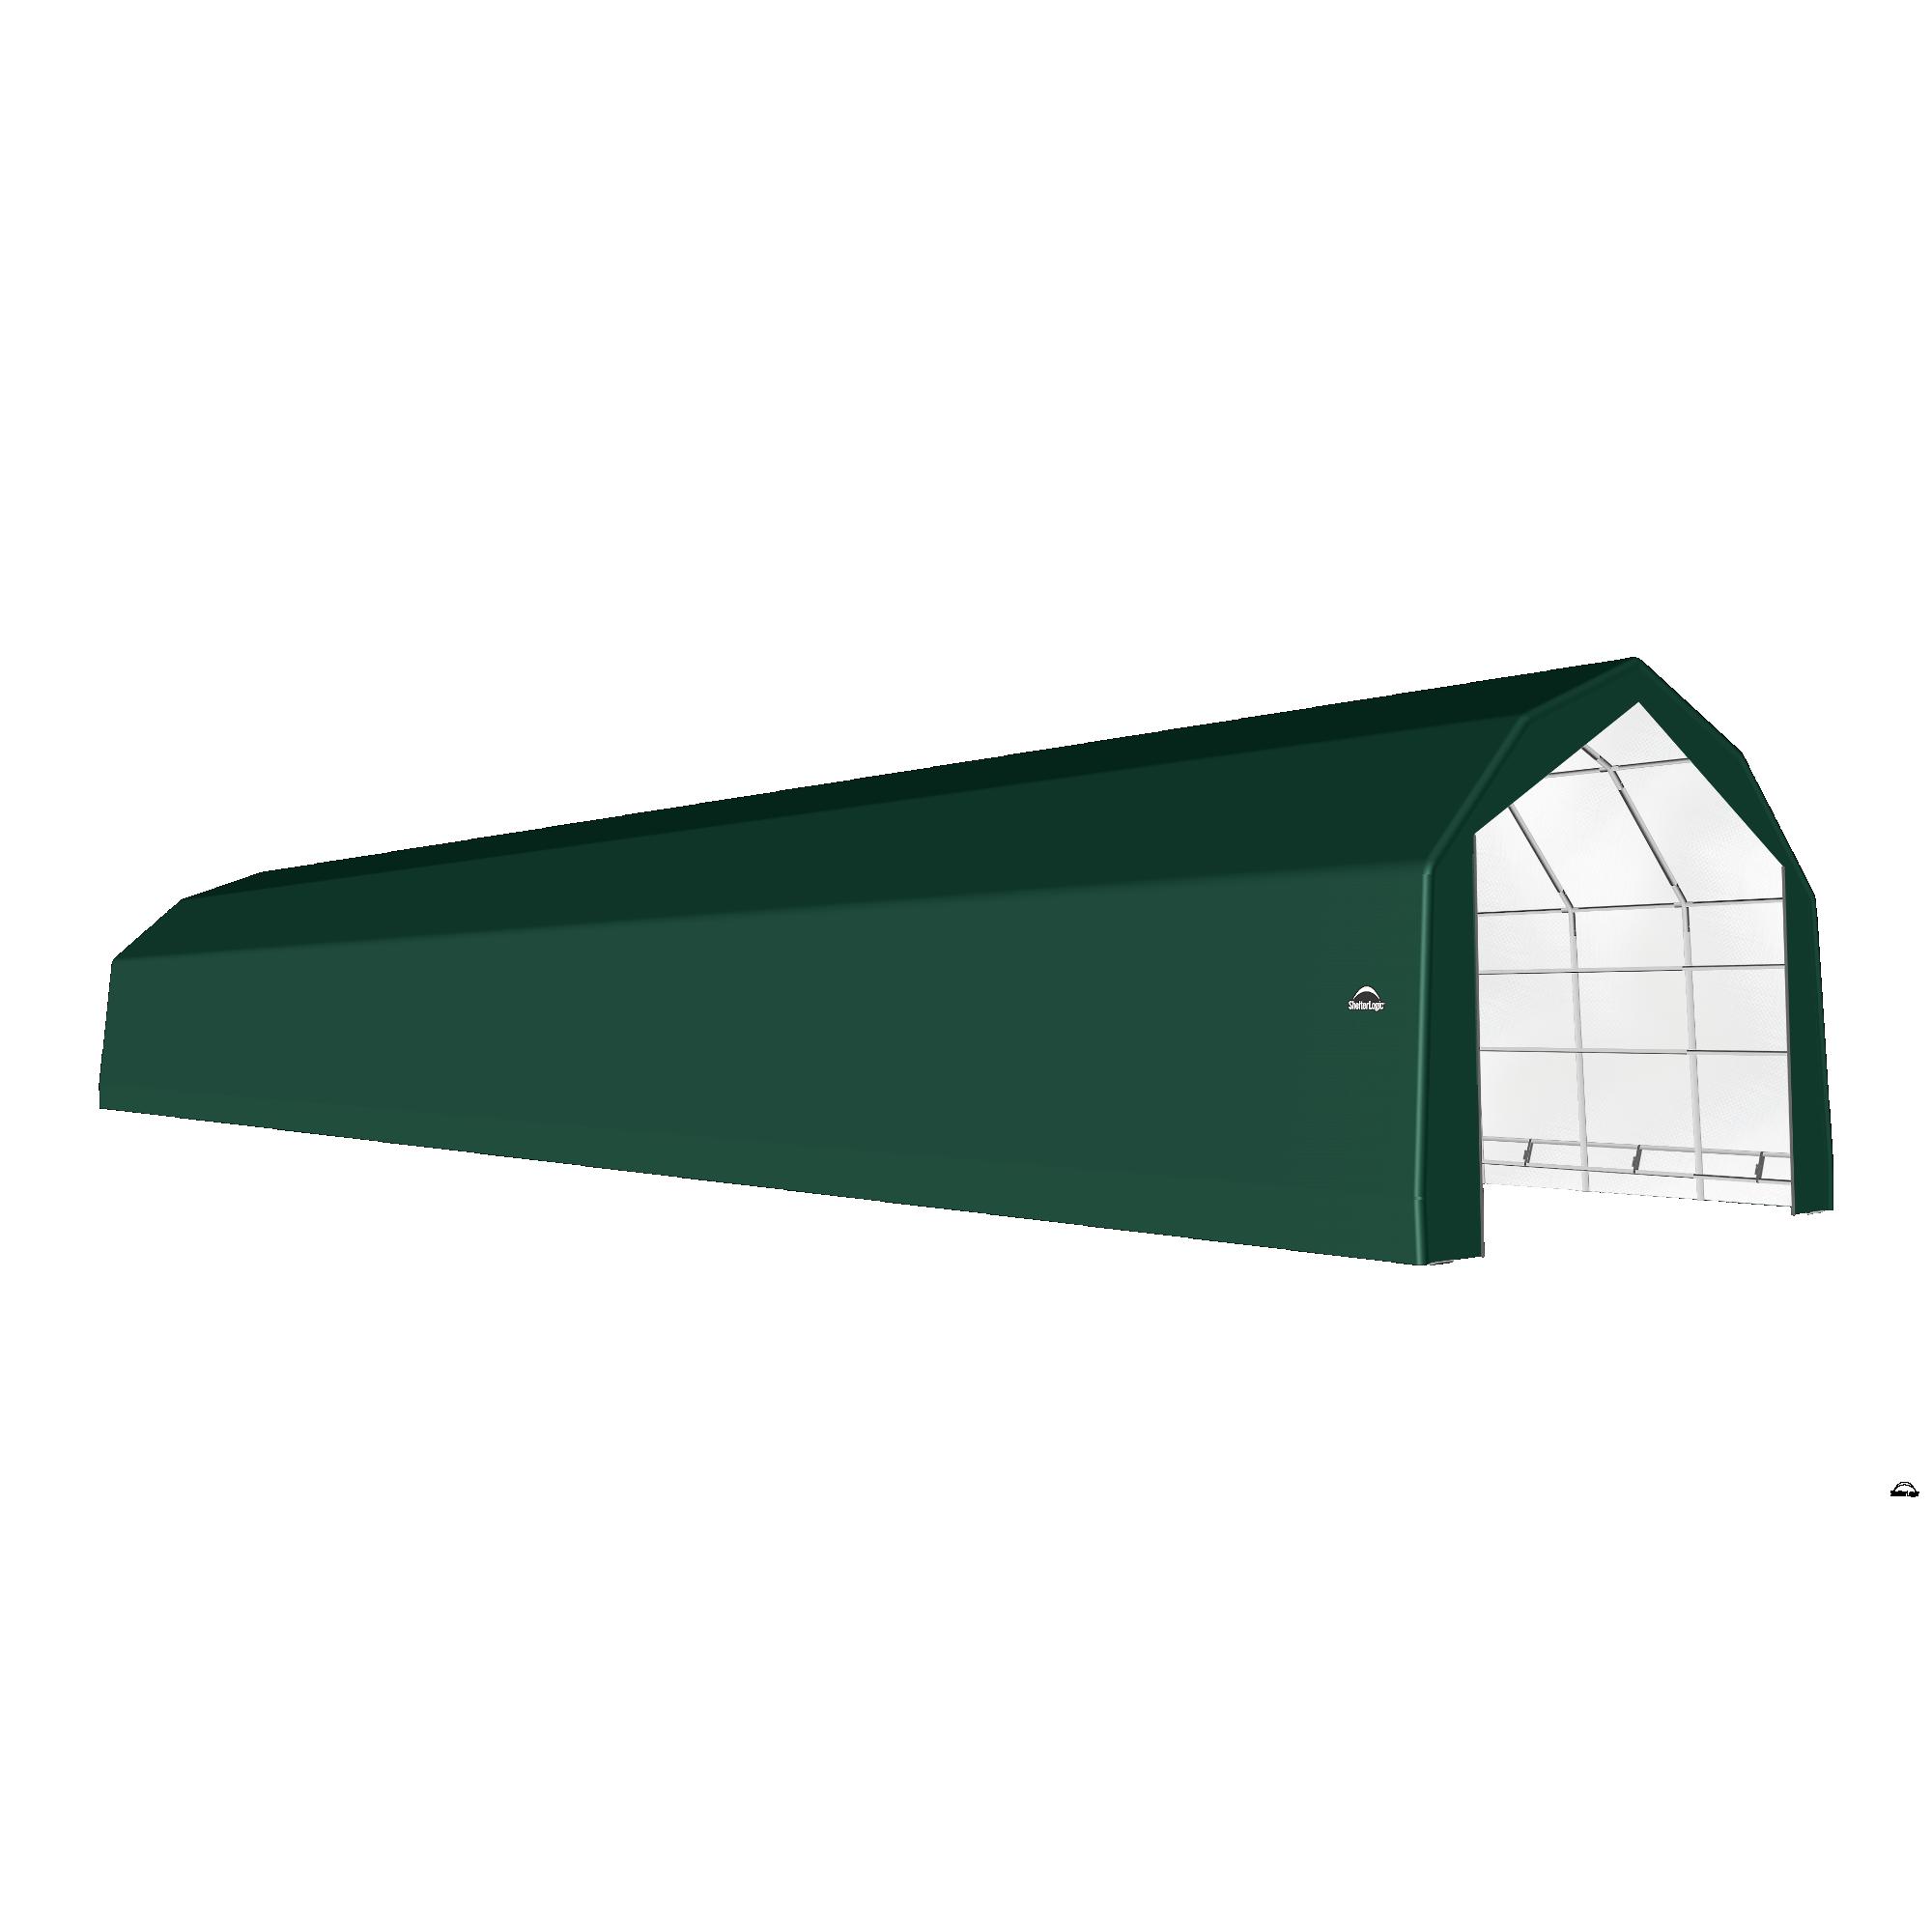 SP Barn 20X100X15 Green 14 oz PE Shelter